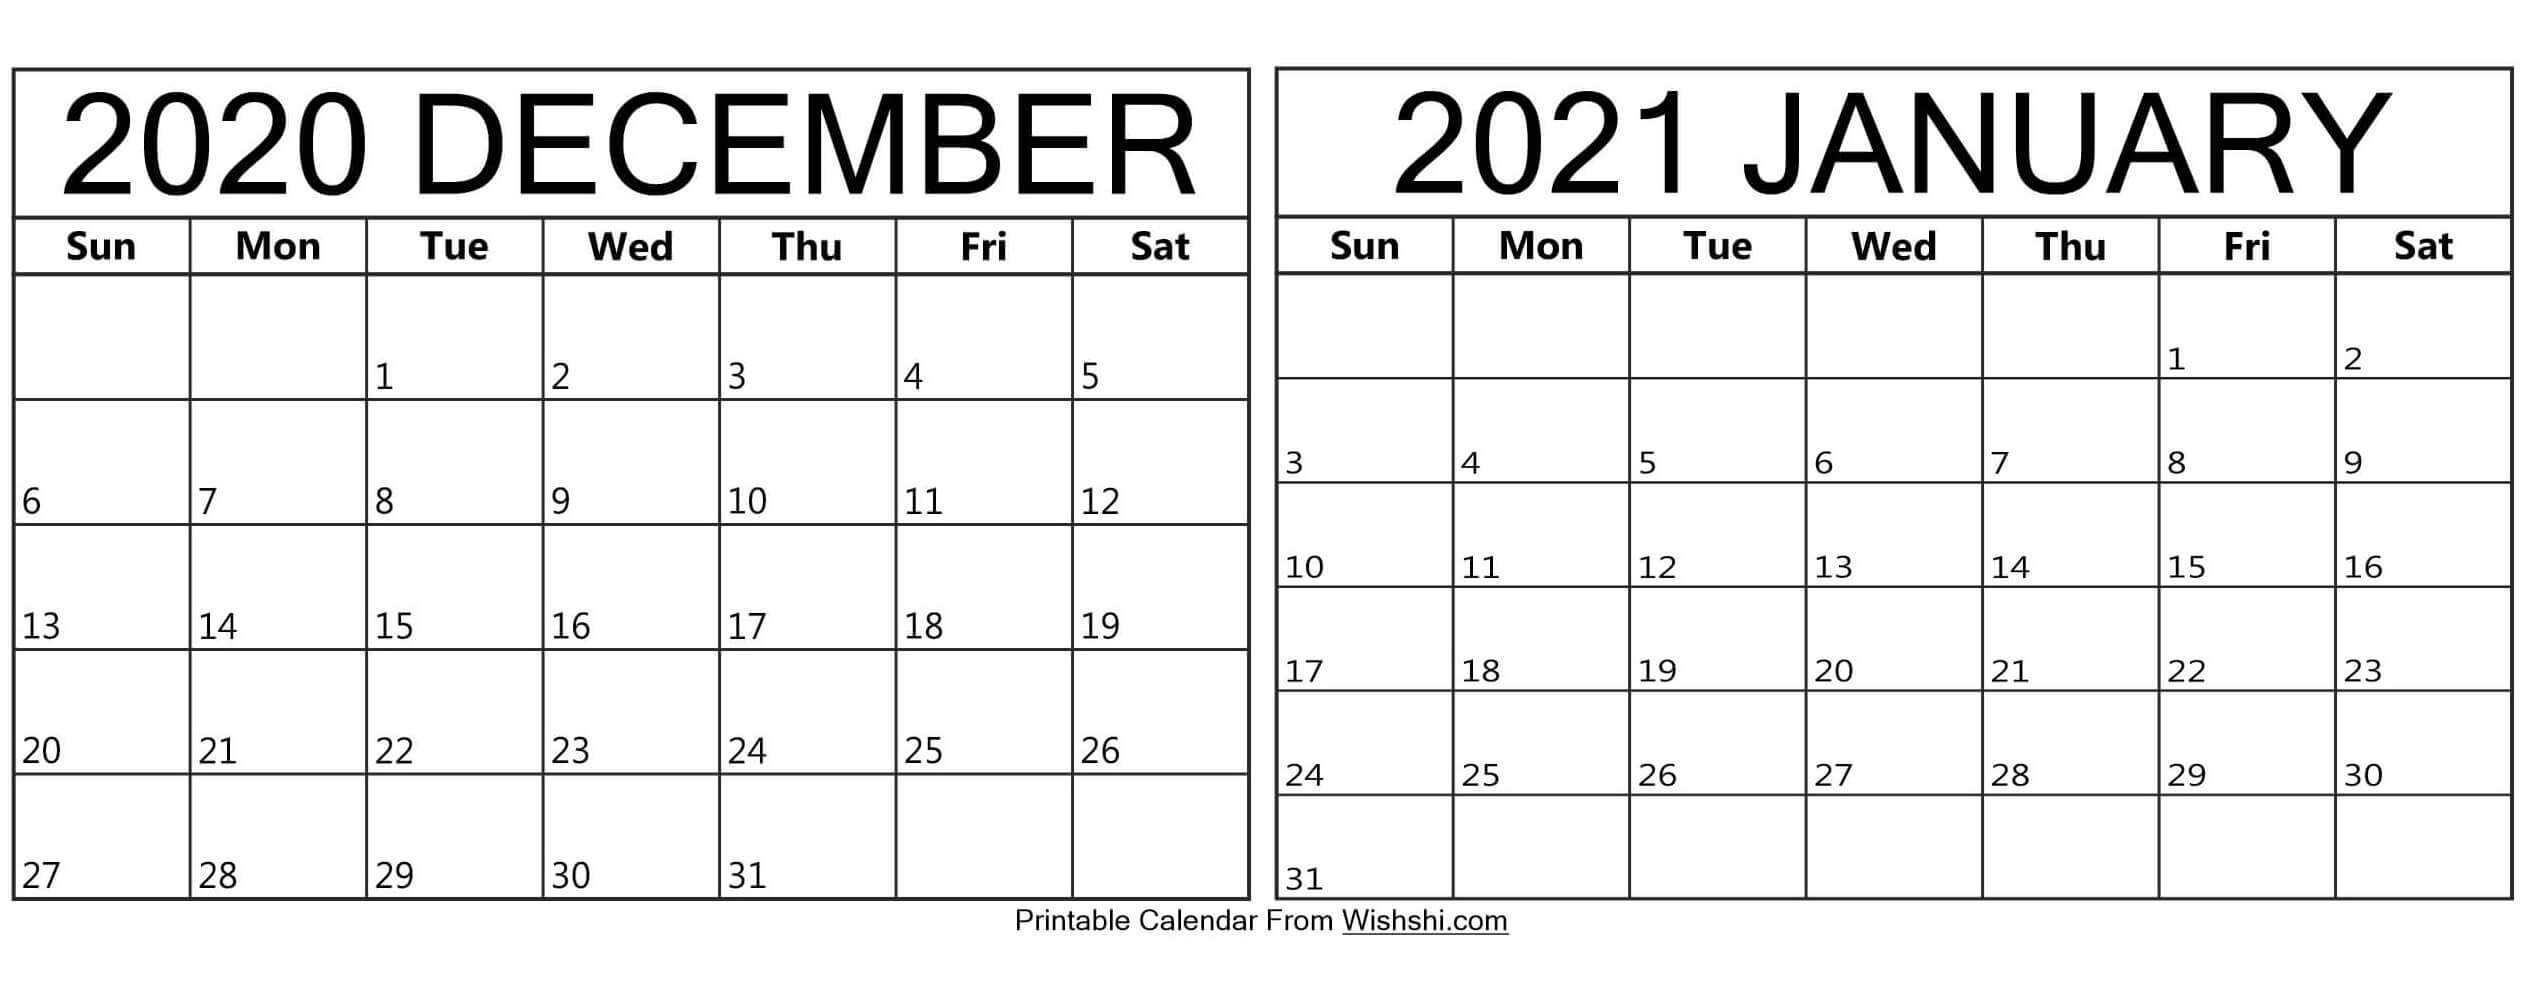 Printable December 2020 January 2021 Calendar - Free